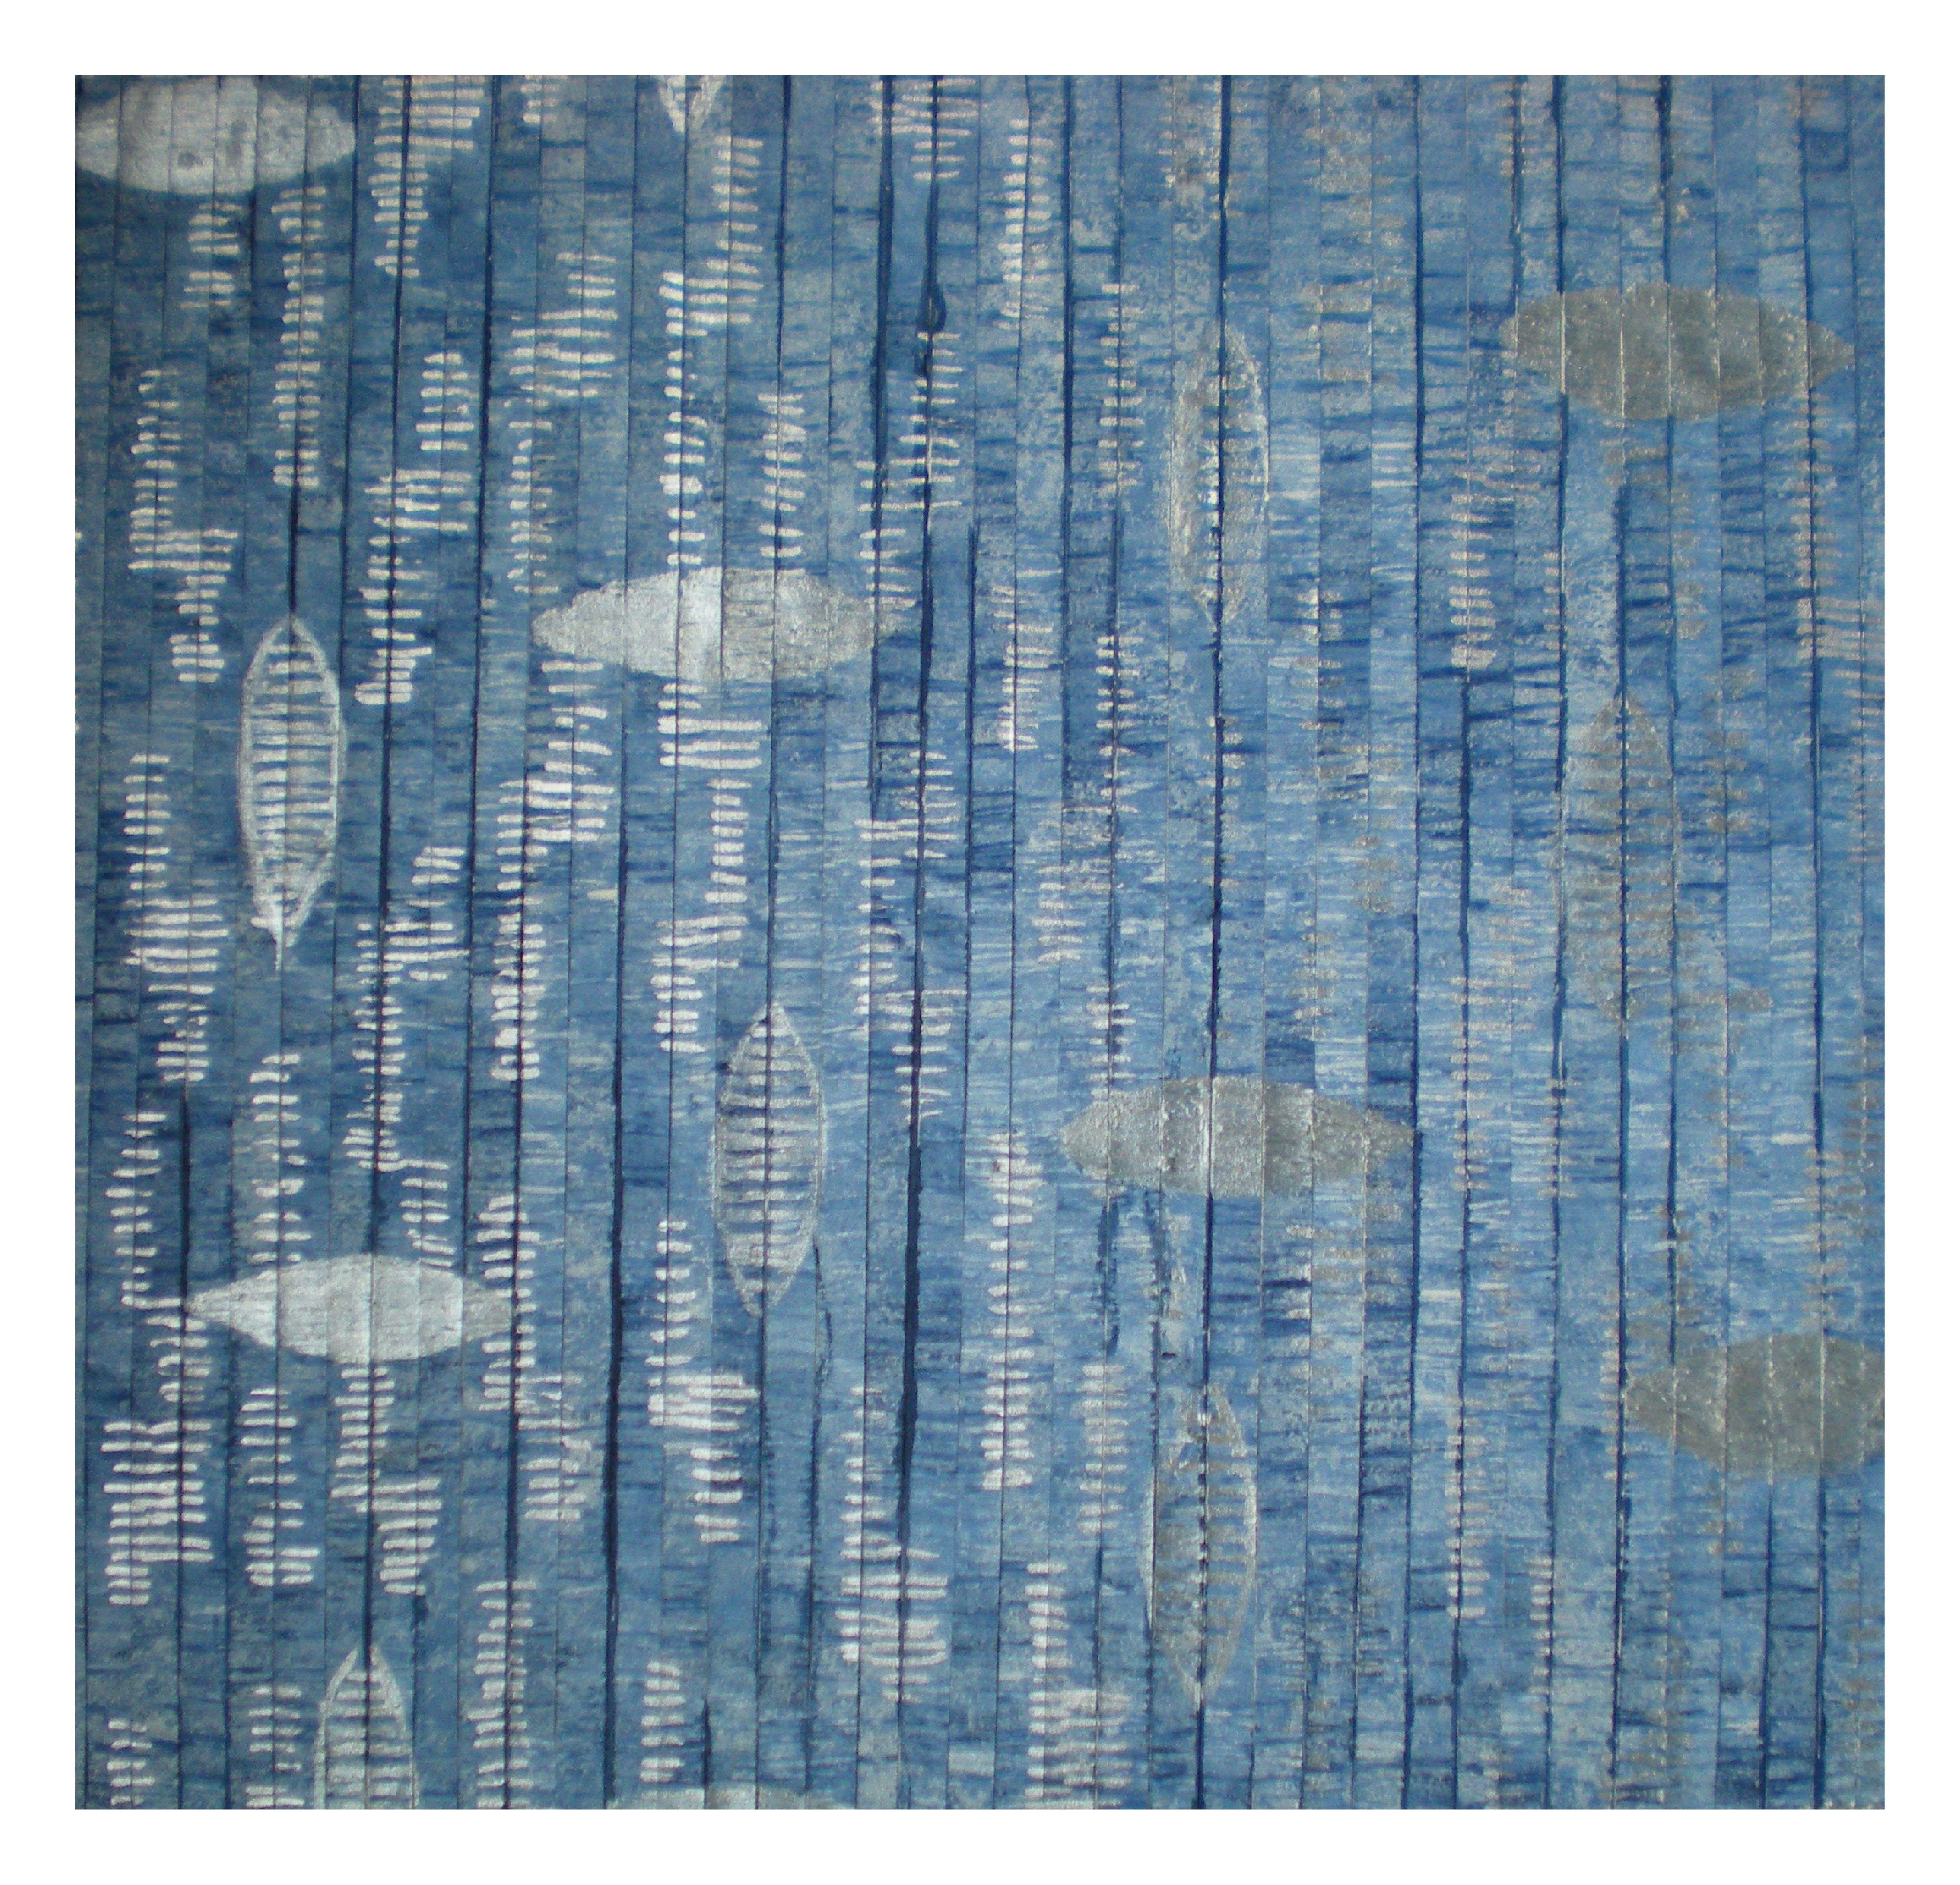 blauw en zilver2 - Ankie Prij